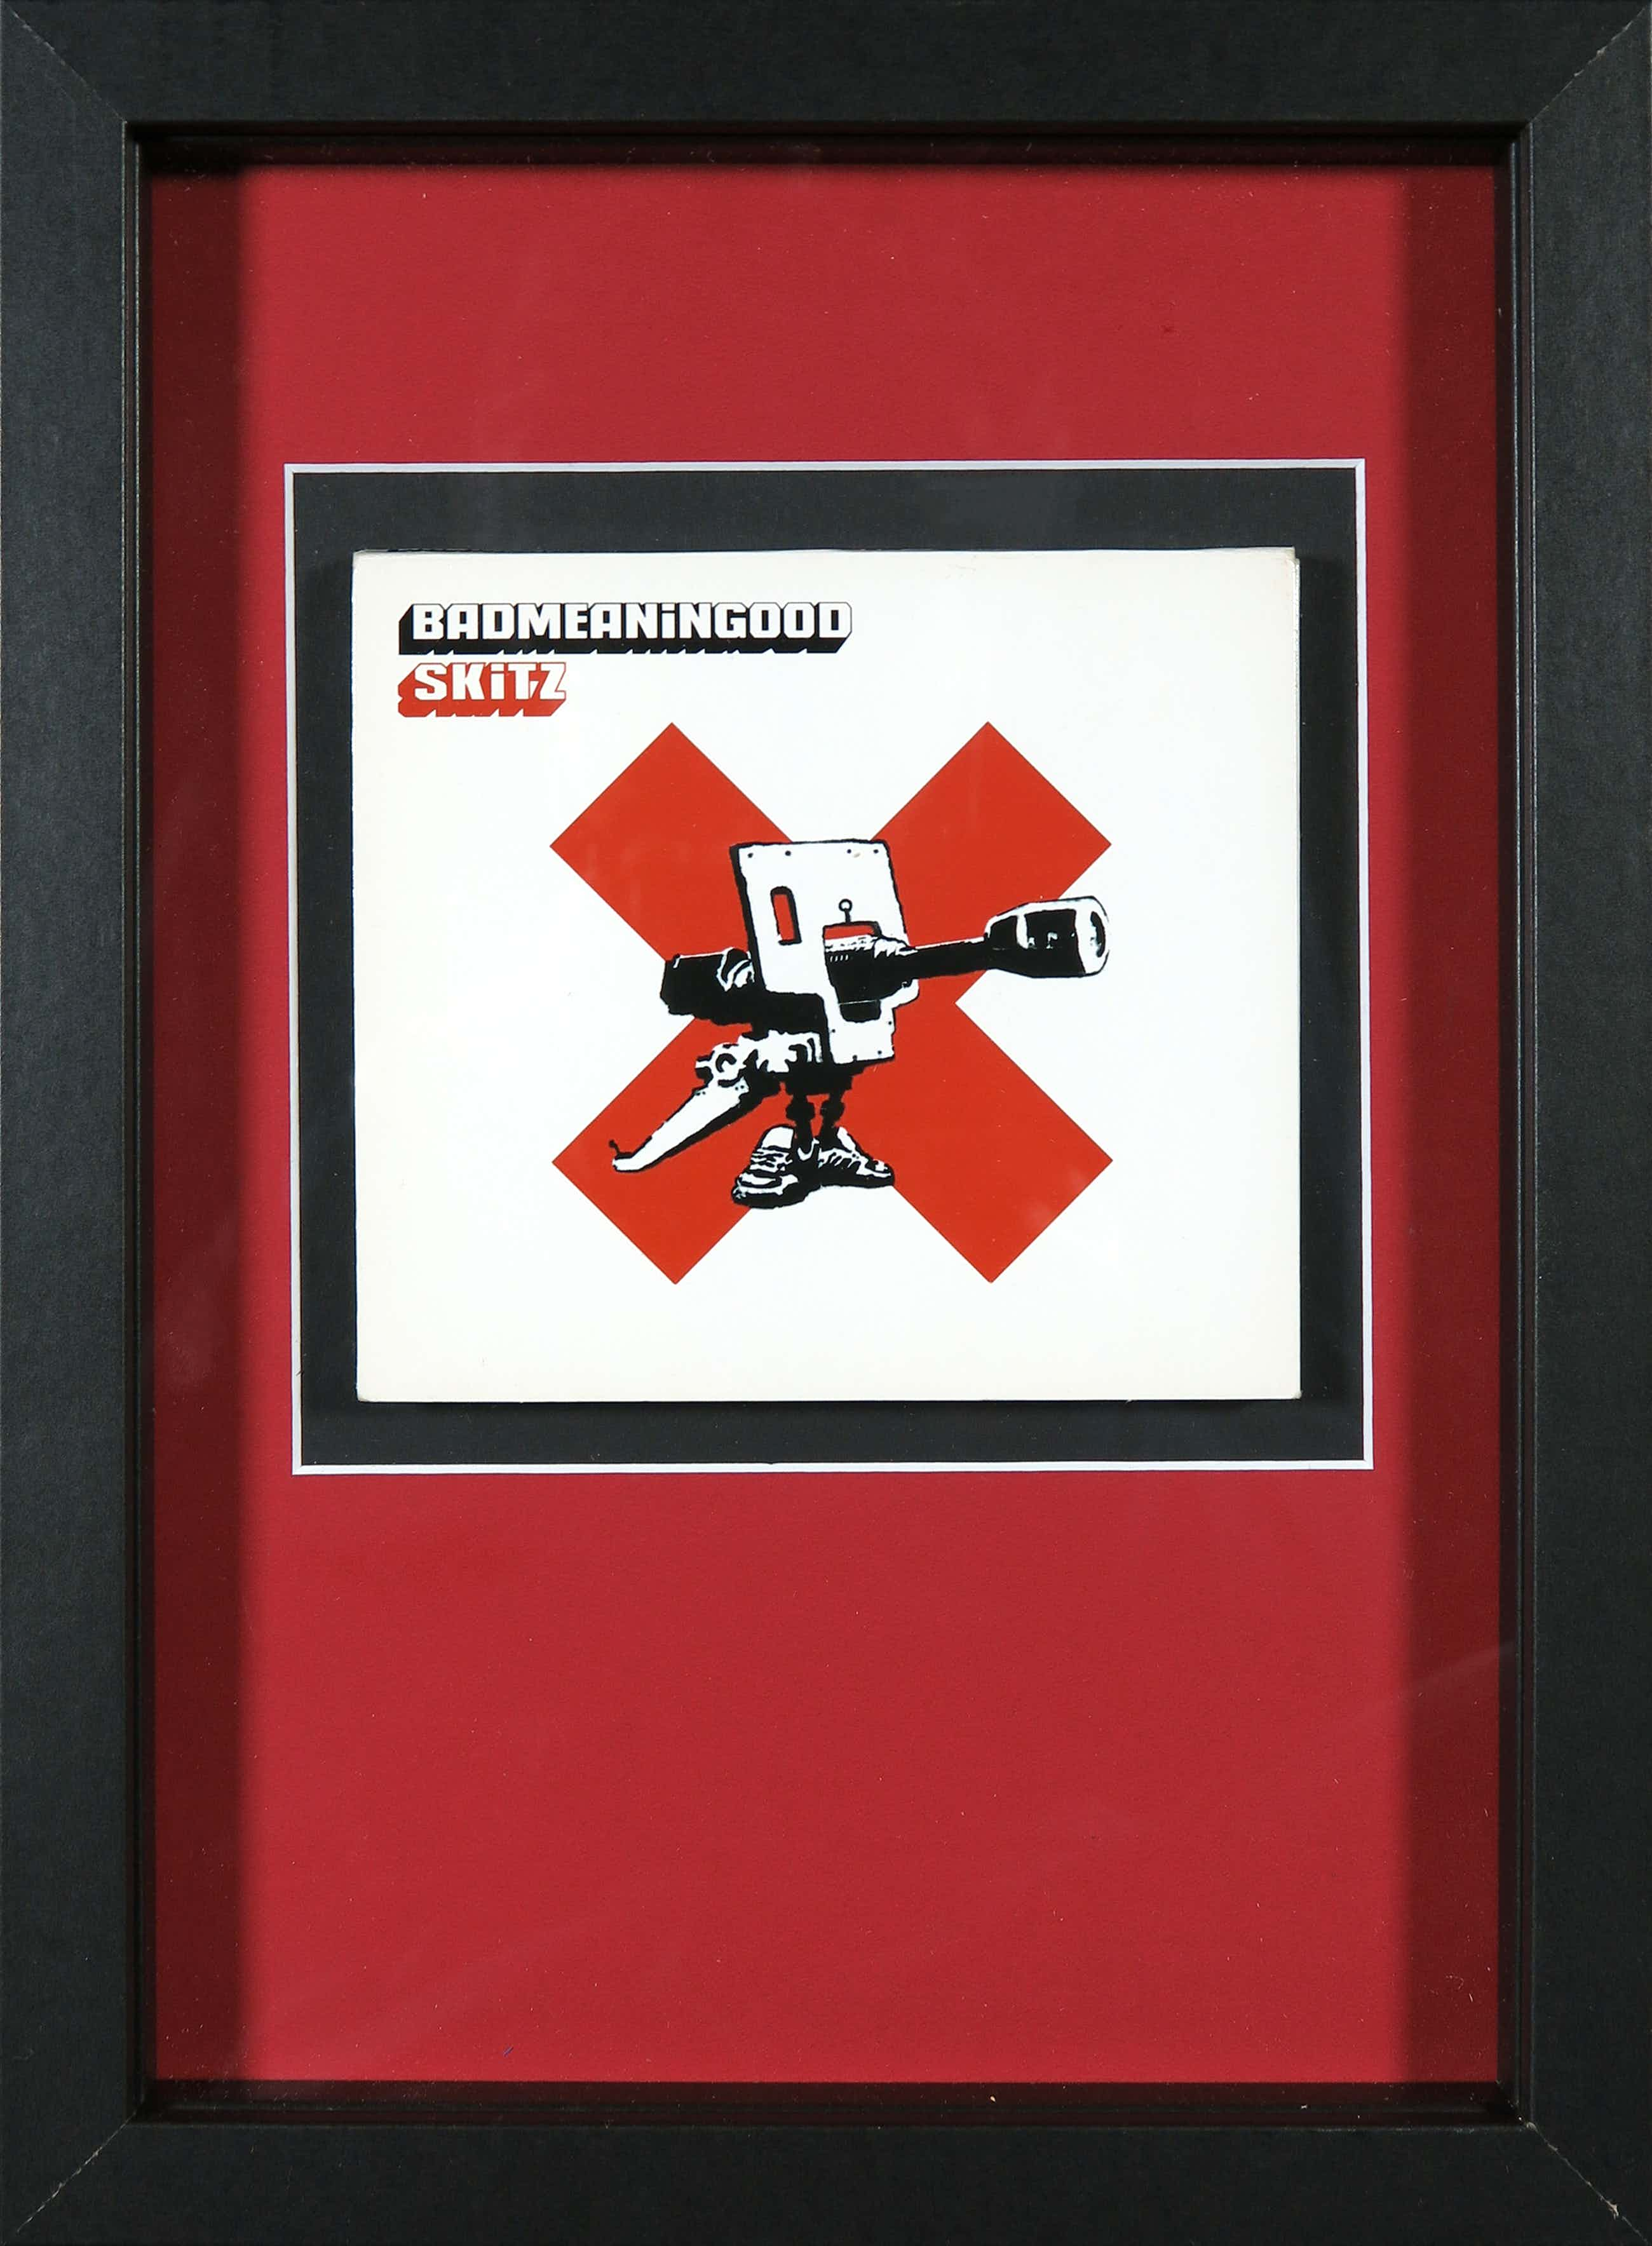 Banksy - Skitz - Badmeaninggood Vol. 1 (CD) kopen? Bied vanaf 100!